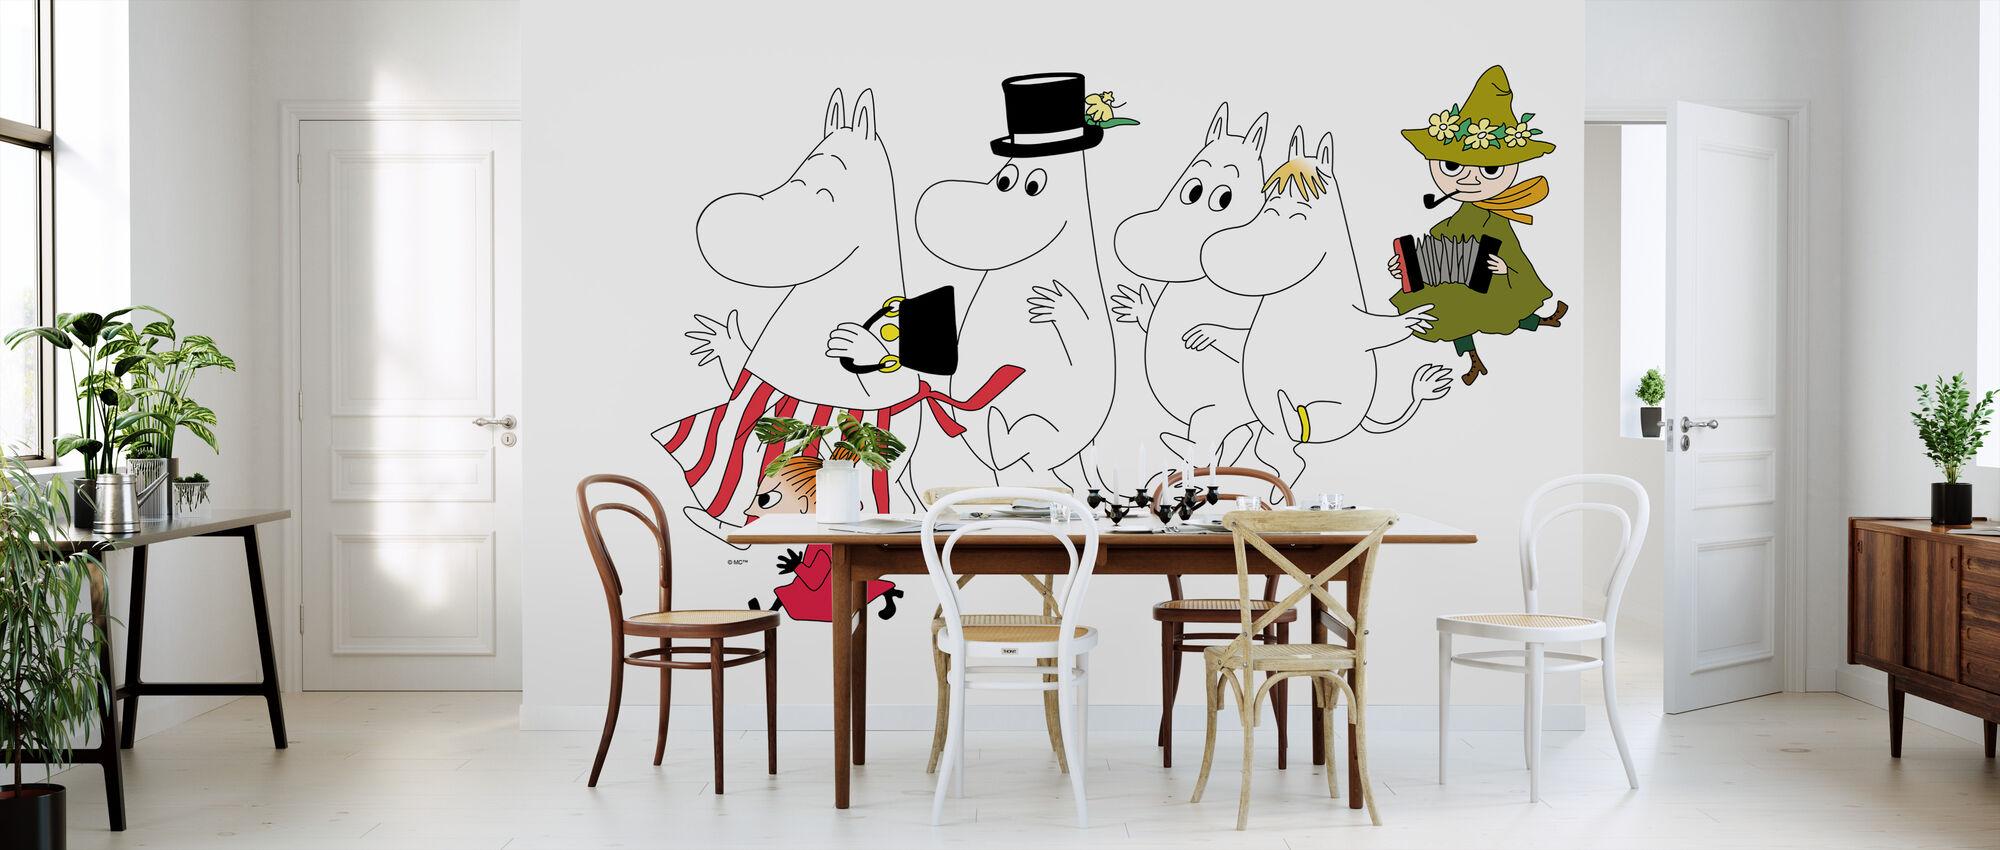 Moomin - The Moomins - Wallpaper - Kitchen